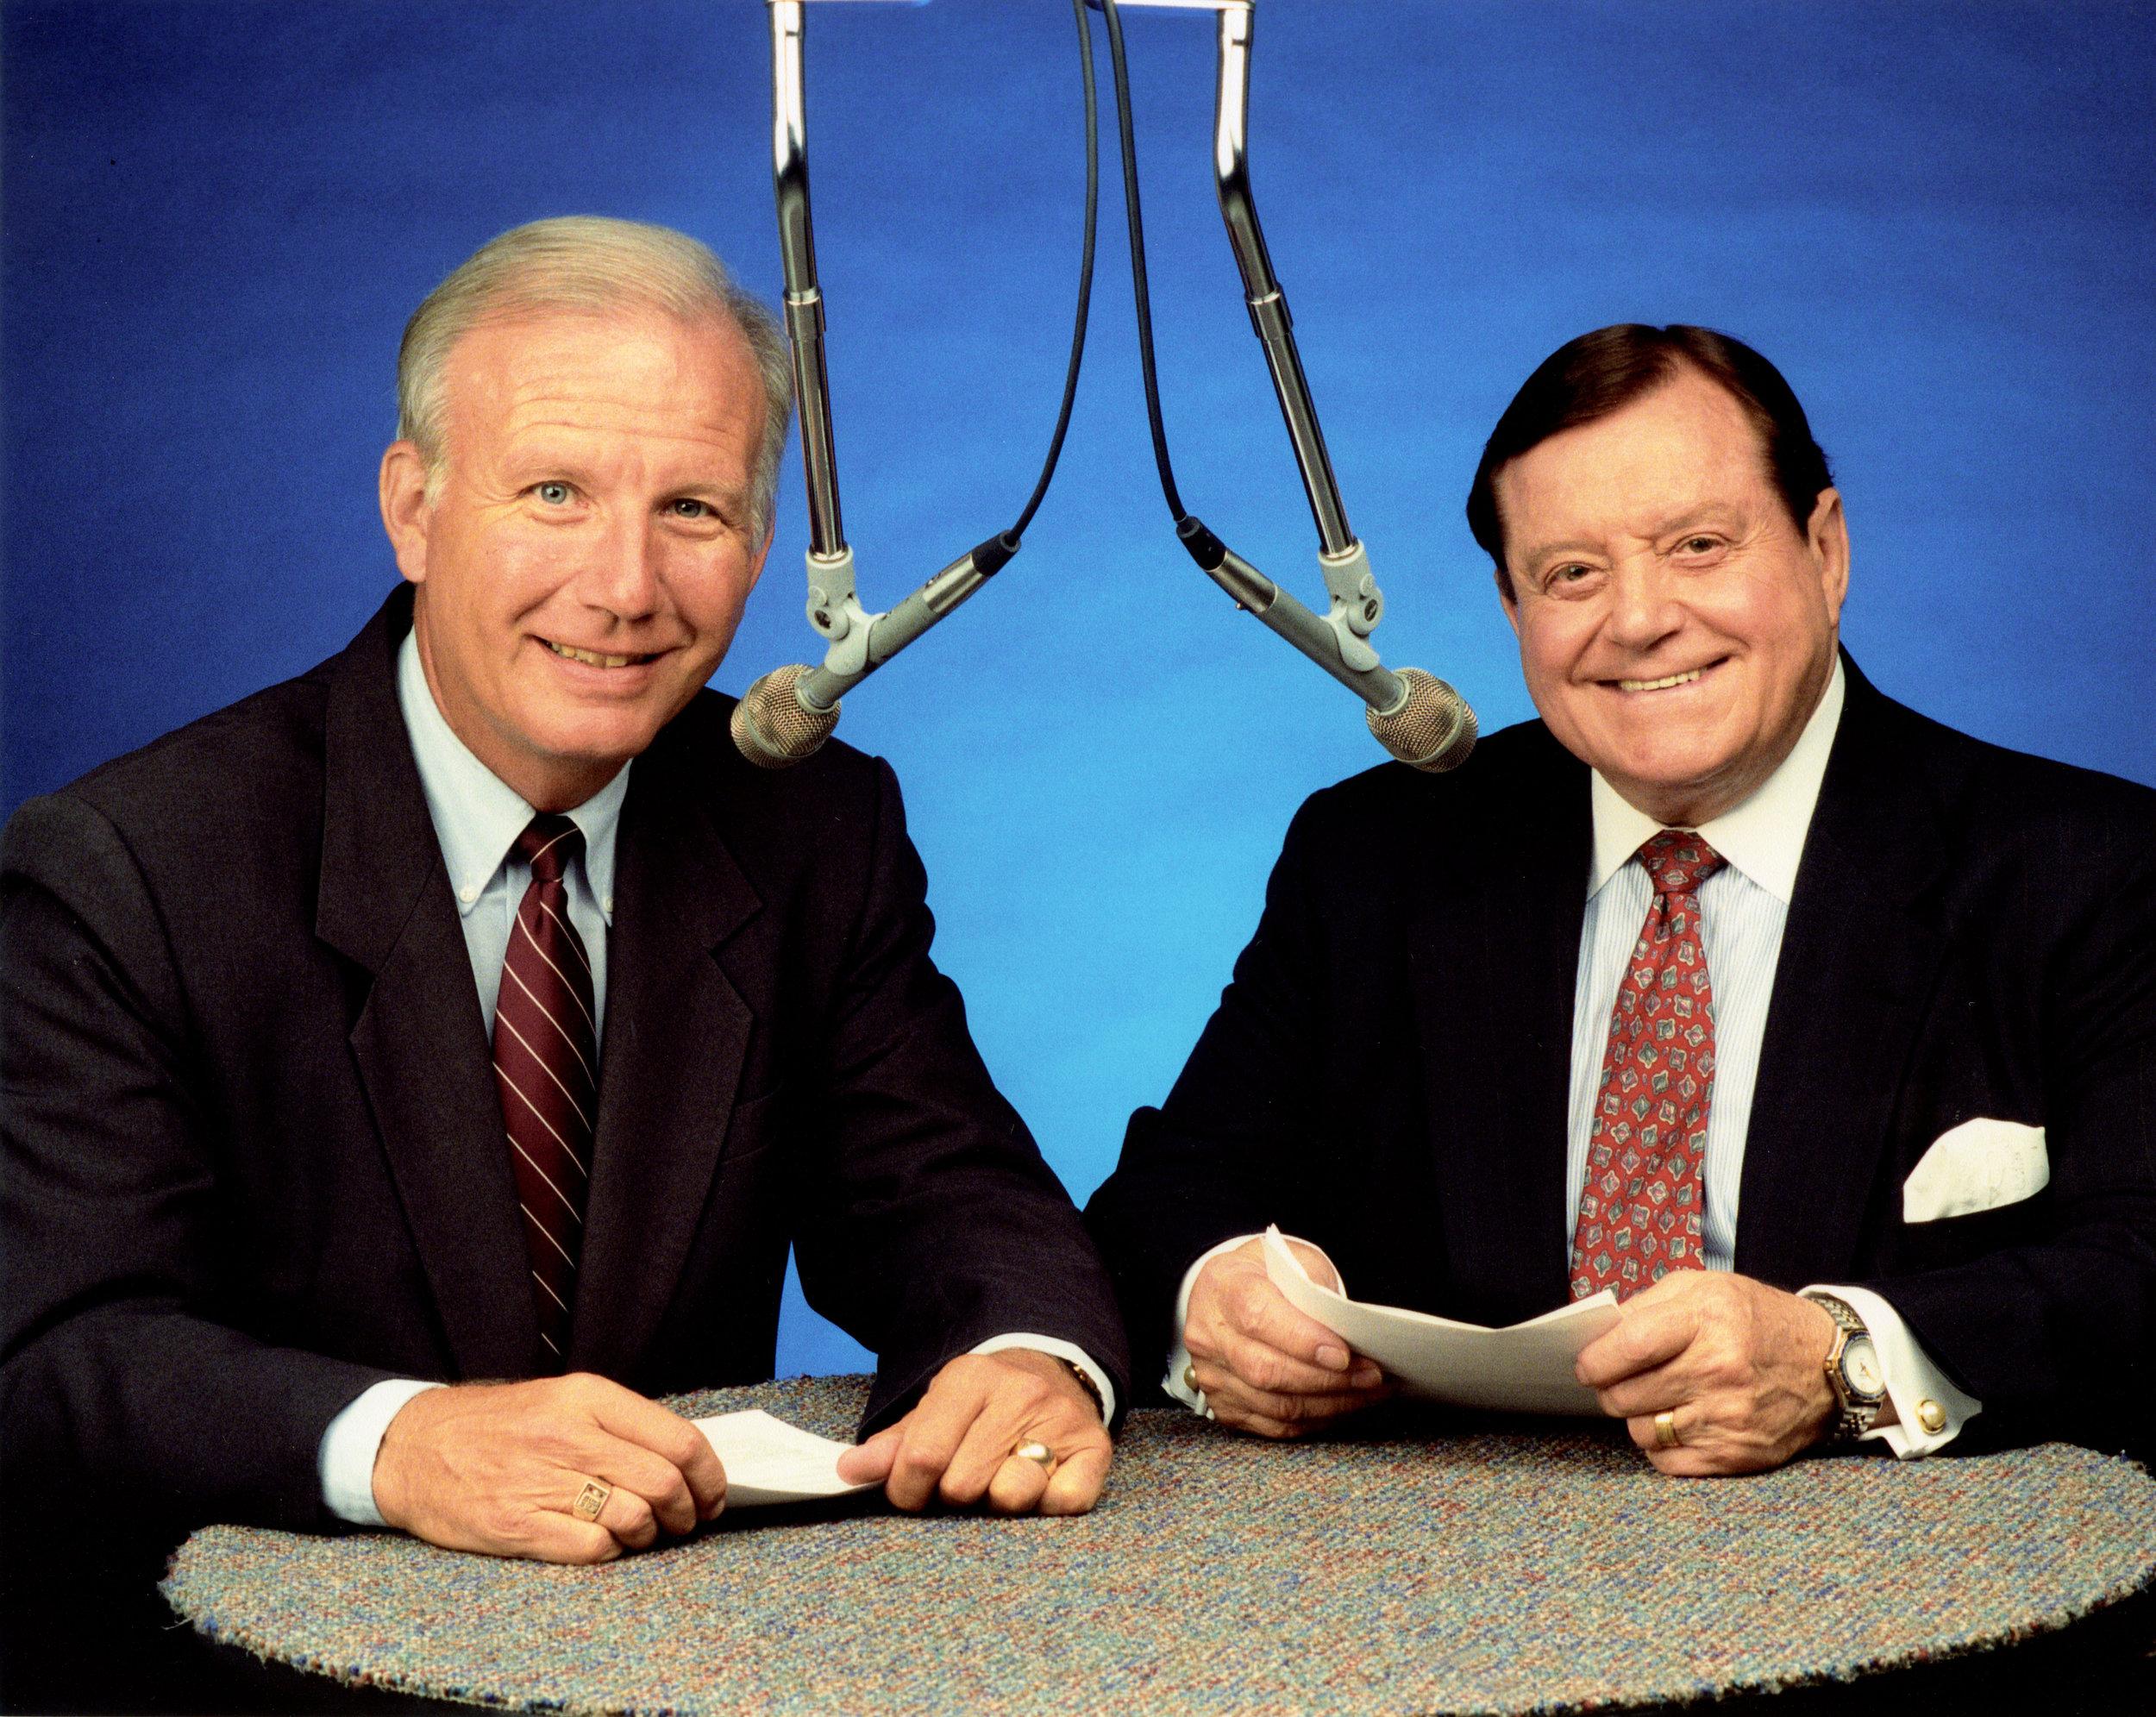 Steve-Douglass-Bill-Bright-Lighthouse-Report-2001.jpg